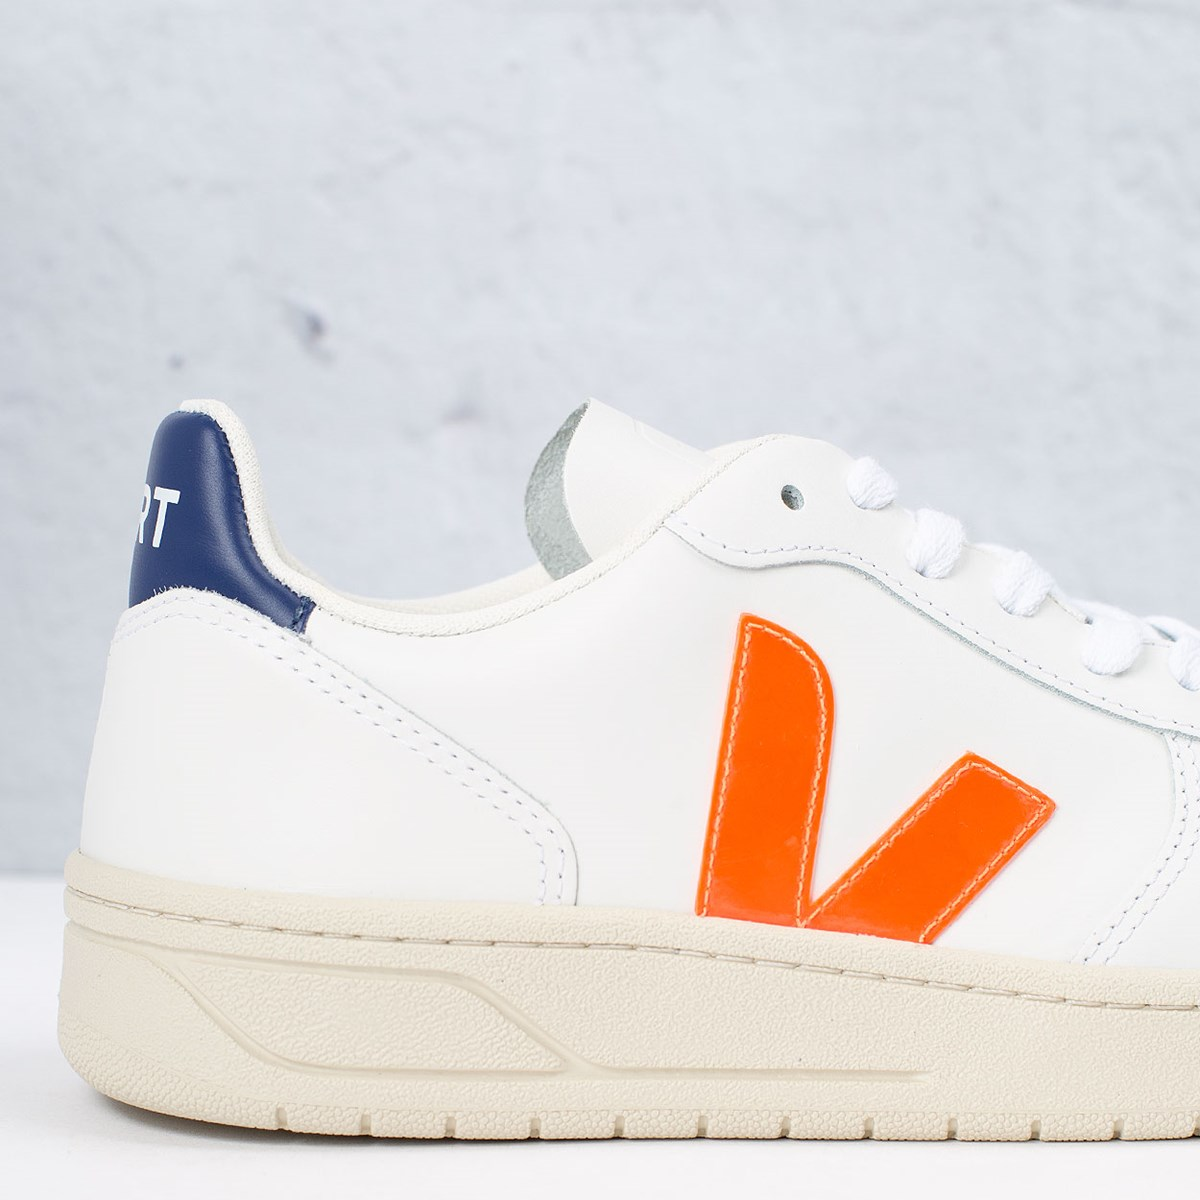 Tênis Vert Shoes V-10 Leather Extra White Orange Fluo Cobalt VX022136